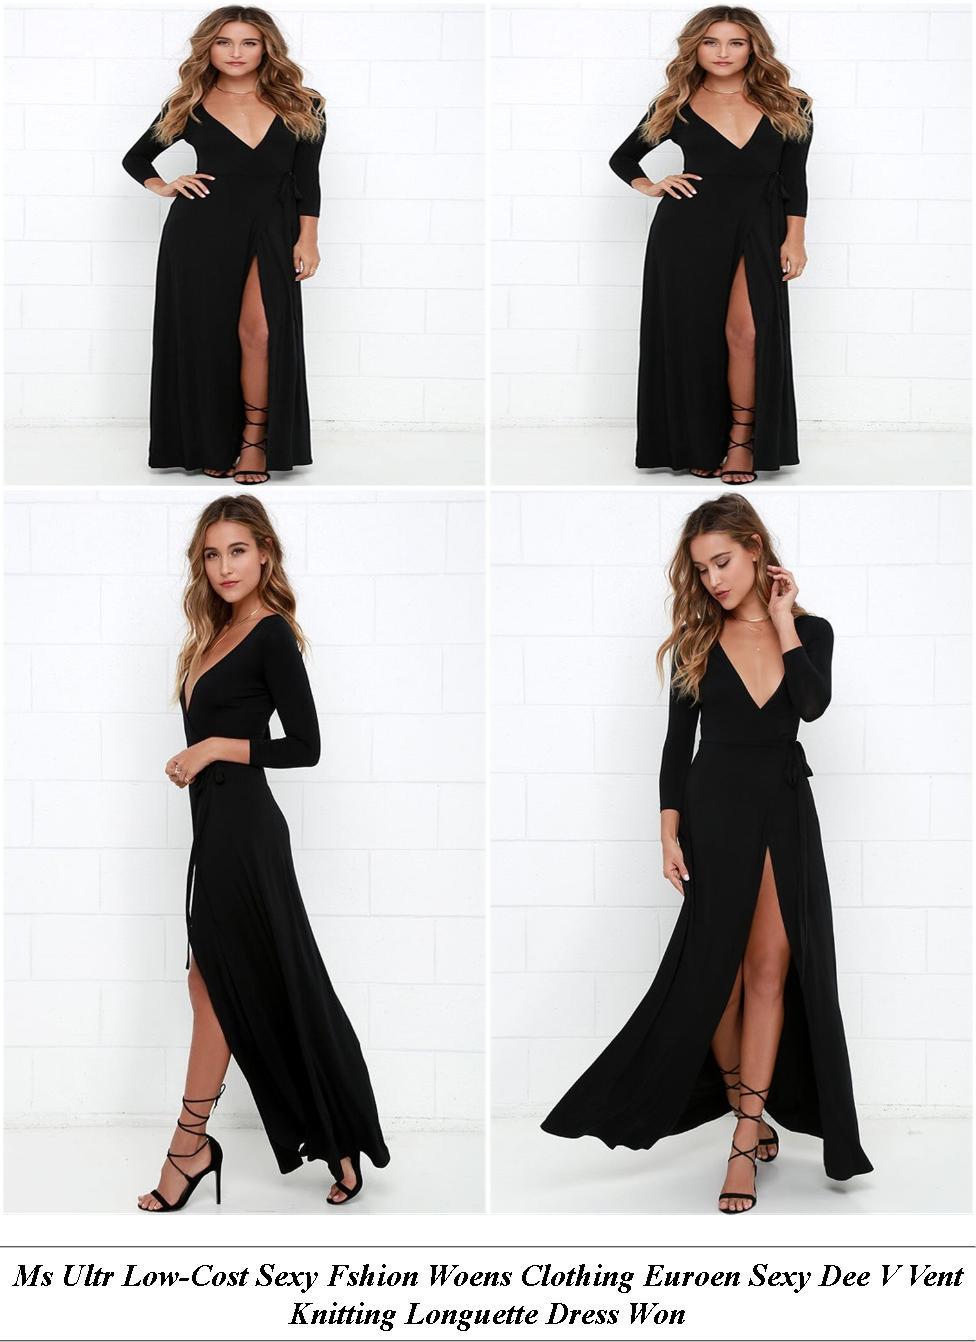 Clothing Dresses Online - Vintage Clothing Dresses Online - Cheap Ridesmaid Dresses Under Pounds